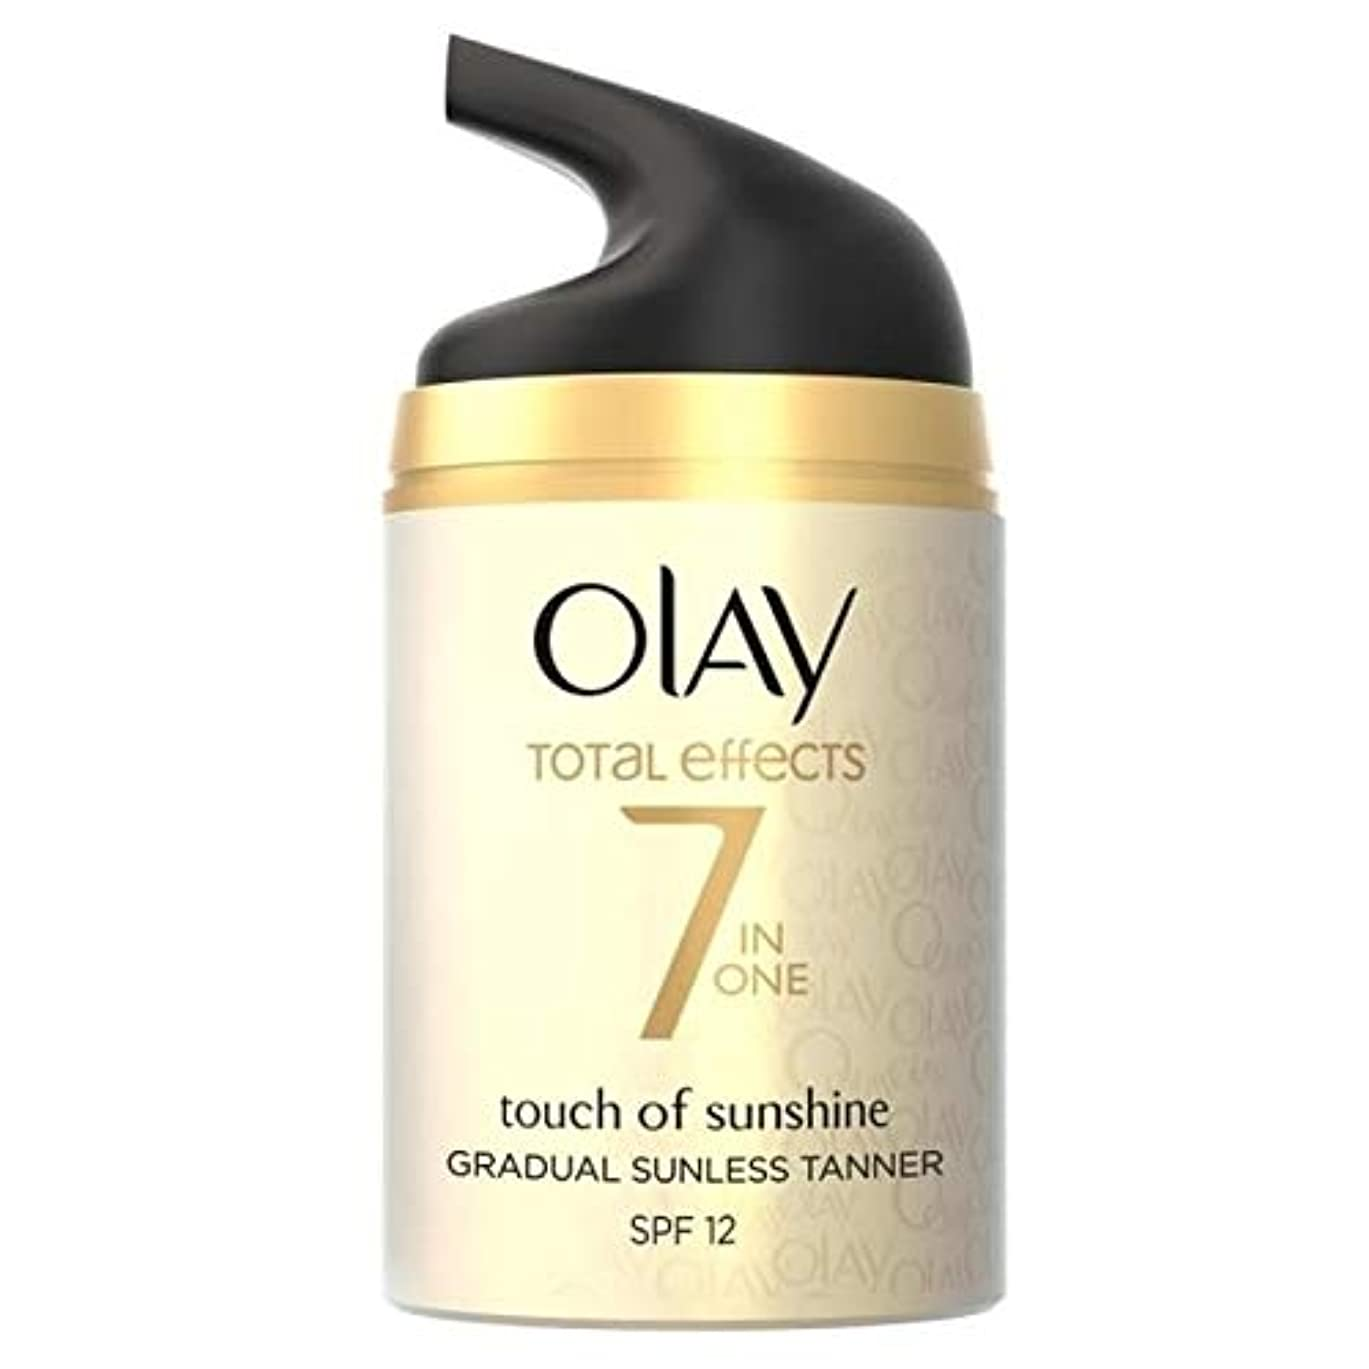 [Olay ] 日照保湿50ミリリットルの総効果の7In1のタッチ - Total Effects 7in1 Touch of Sunshine Moisturiser 50ml [並行輸入品]